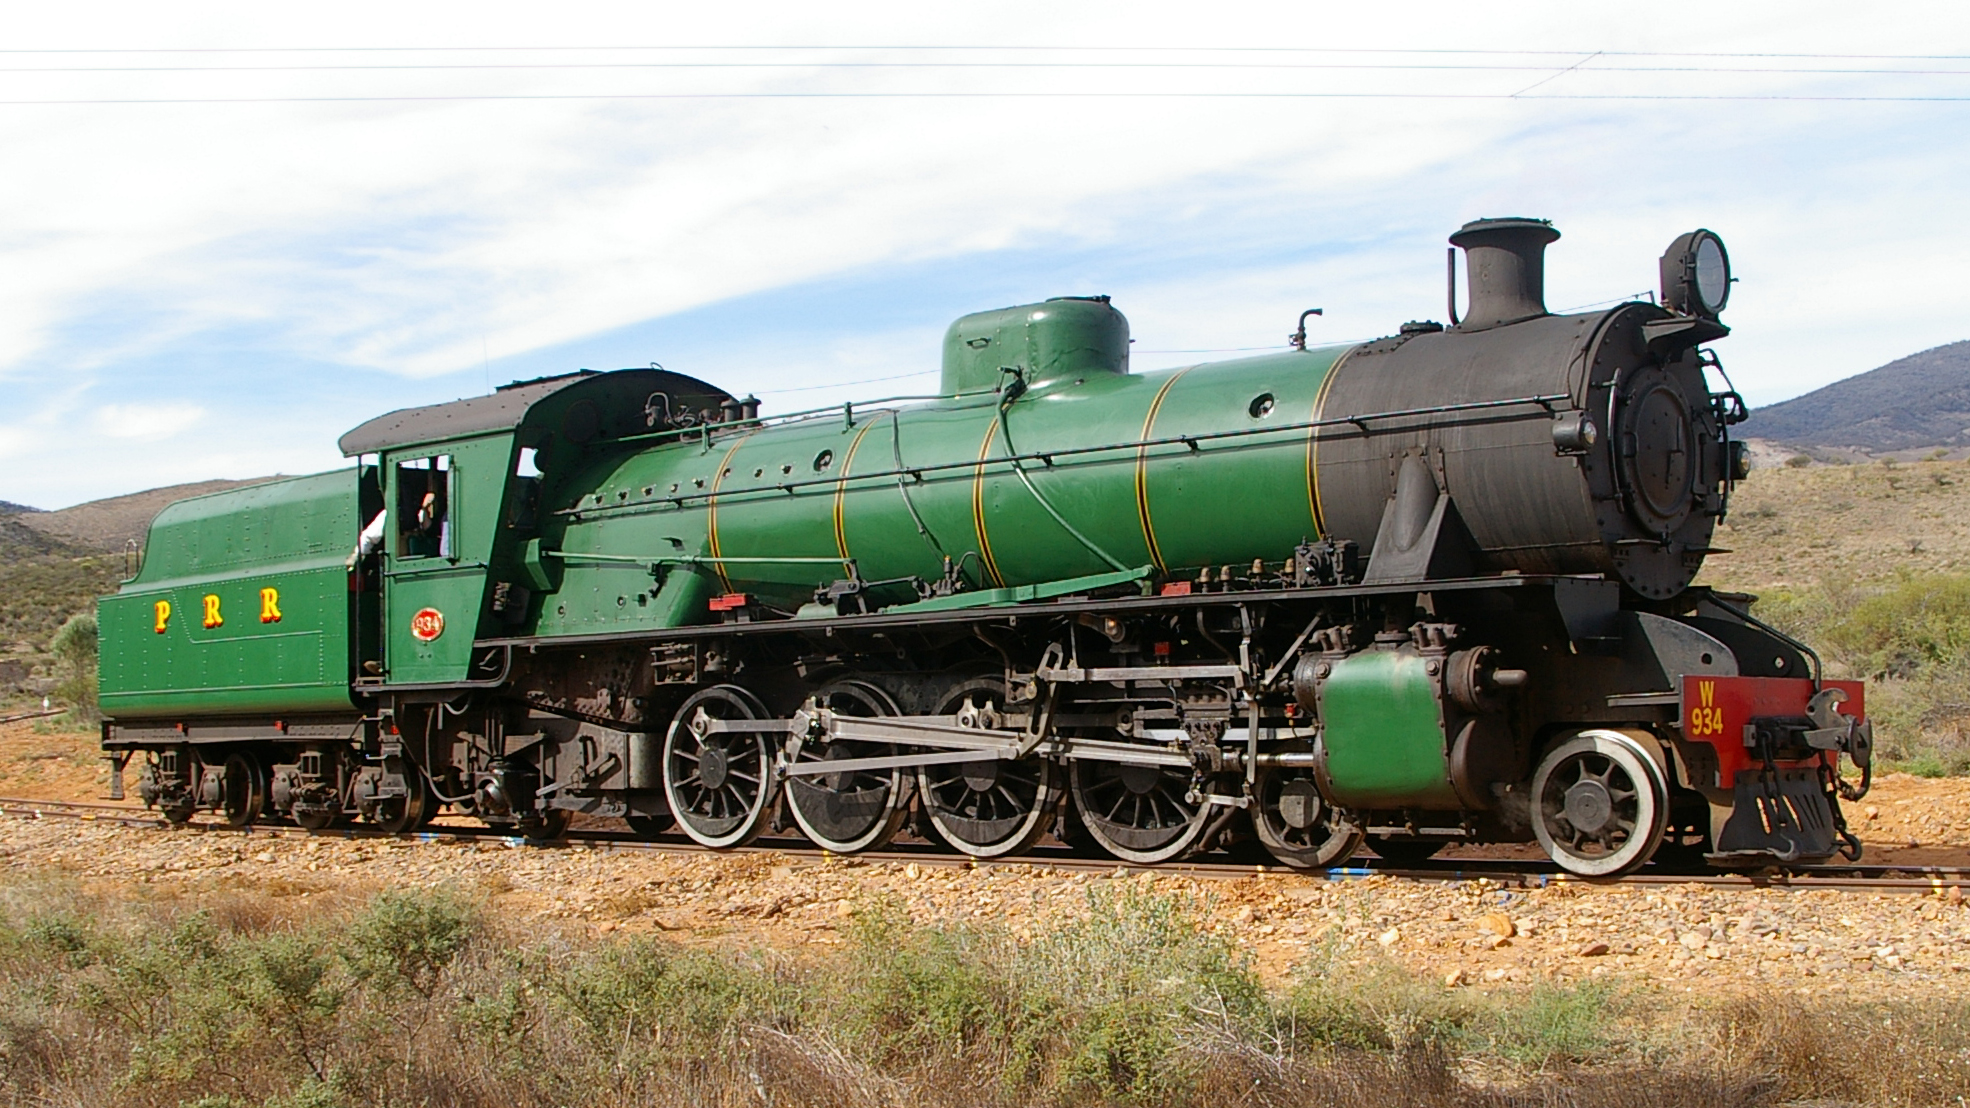 WAGR_locomotive_W934_at_Woolshed_Flat.jpg